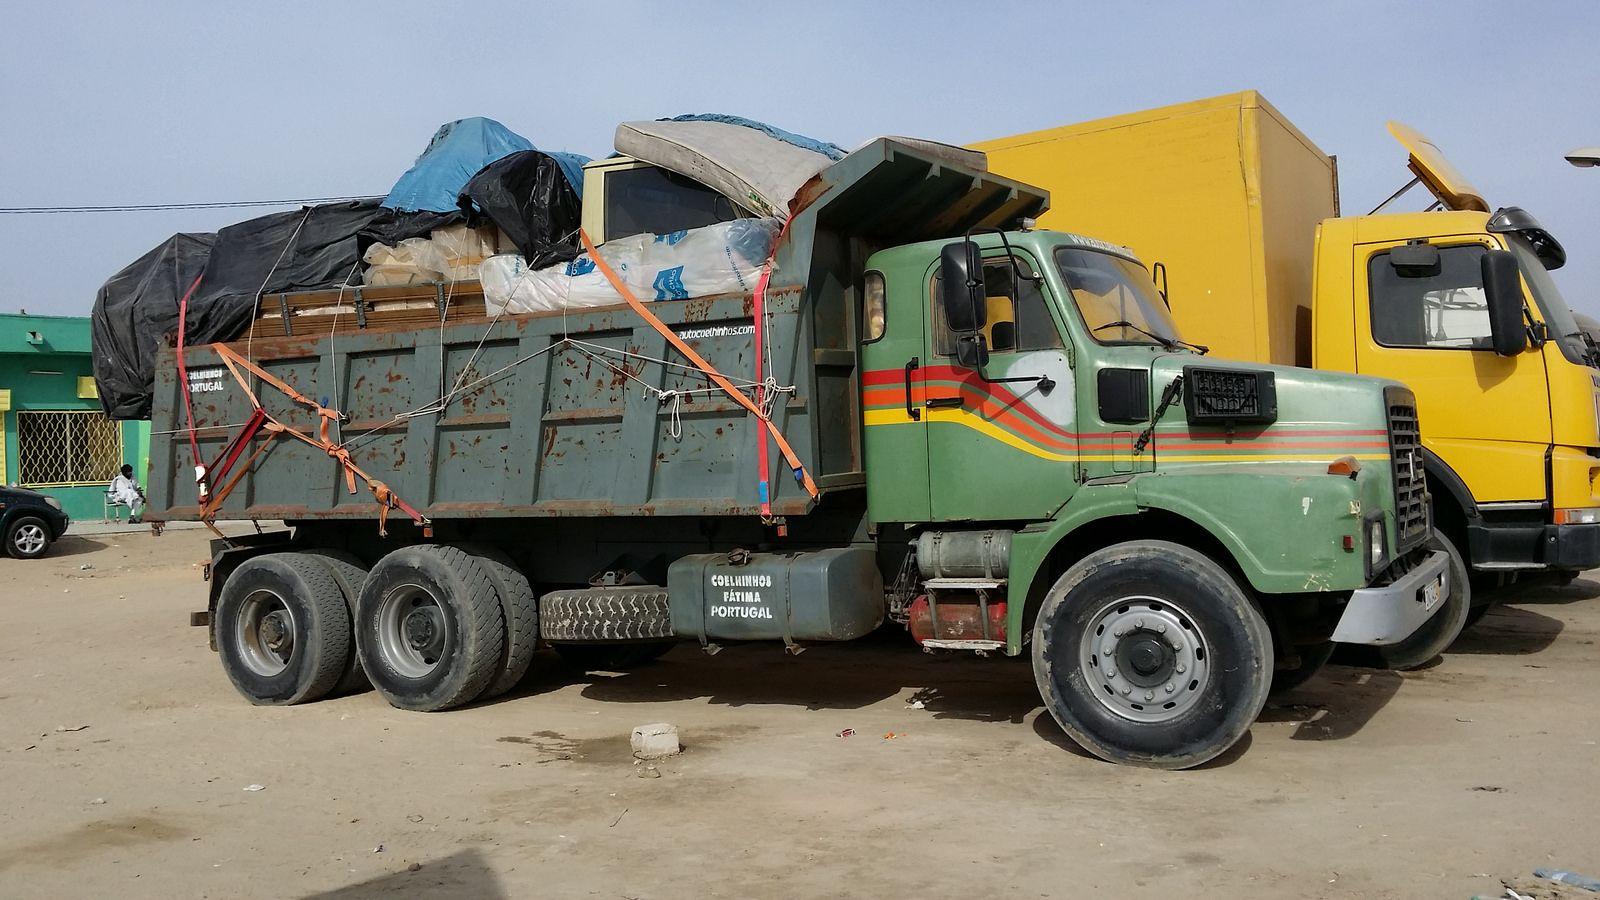 Baumaschinenbilder.de - Forum | Lastwagen aus aller Welt | Lastwagen in Afrika